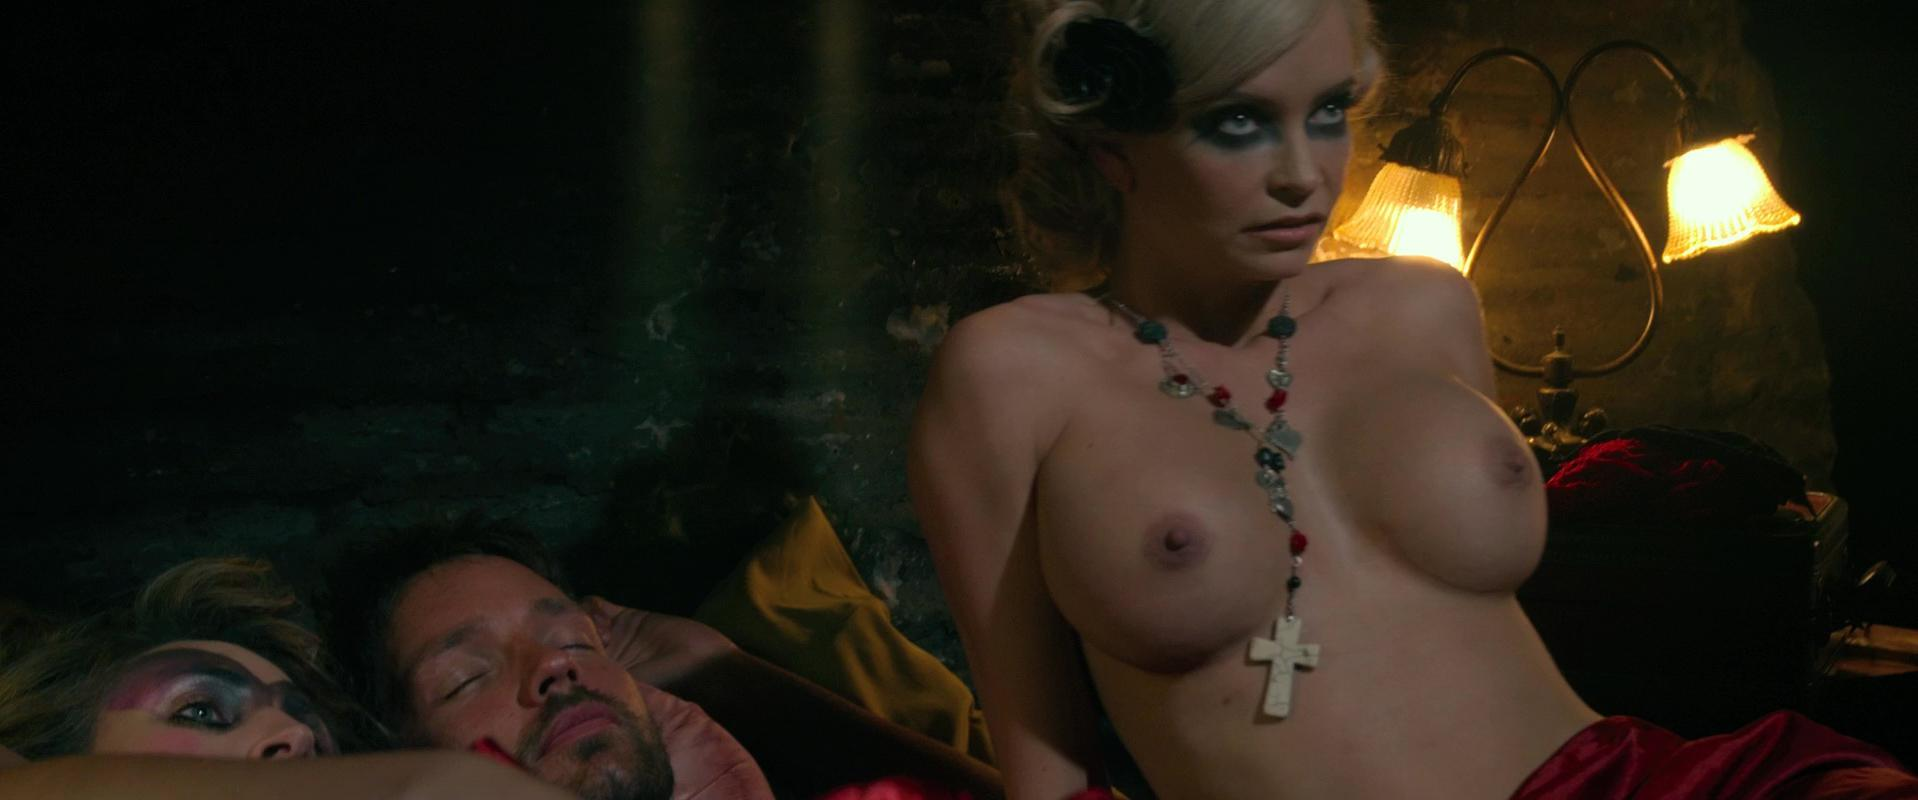 Christian Pitre sexy, Mindy Robinson nude - Bounty Killer (2013)